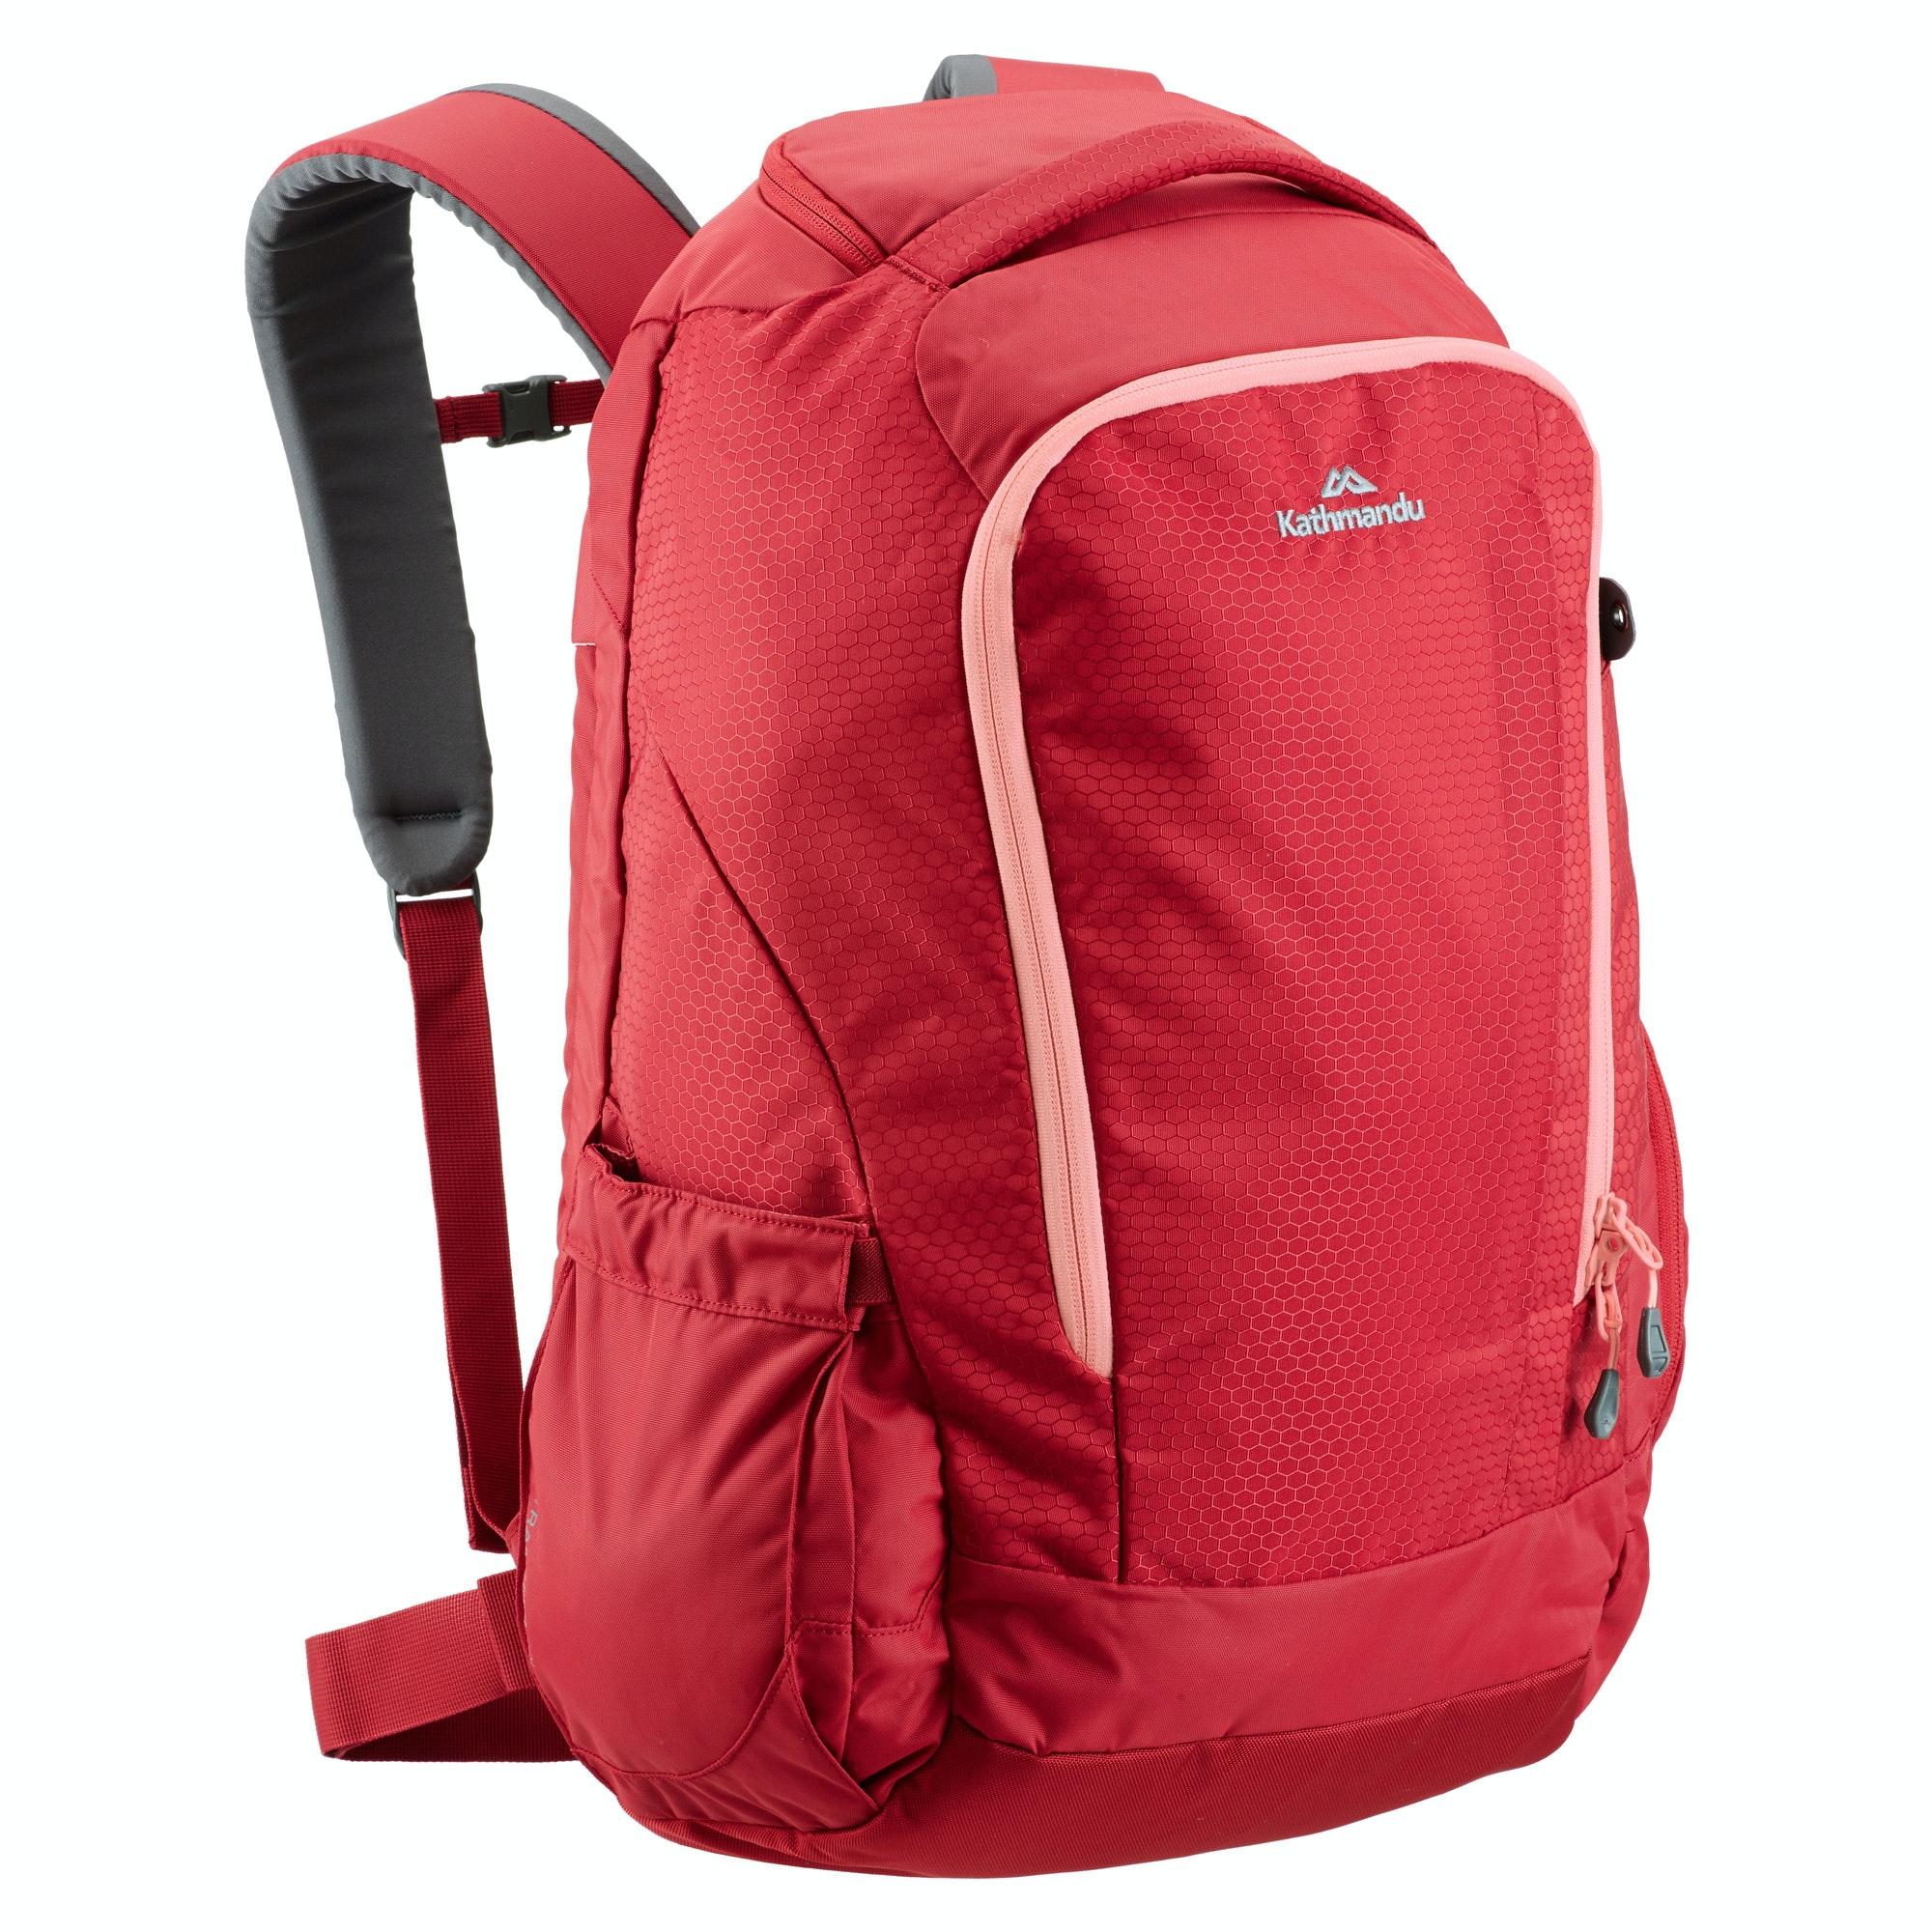 Transfer 30L Travel Laptop Backpack v2 - Black